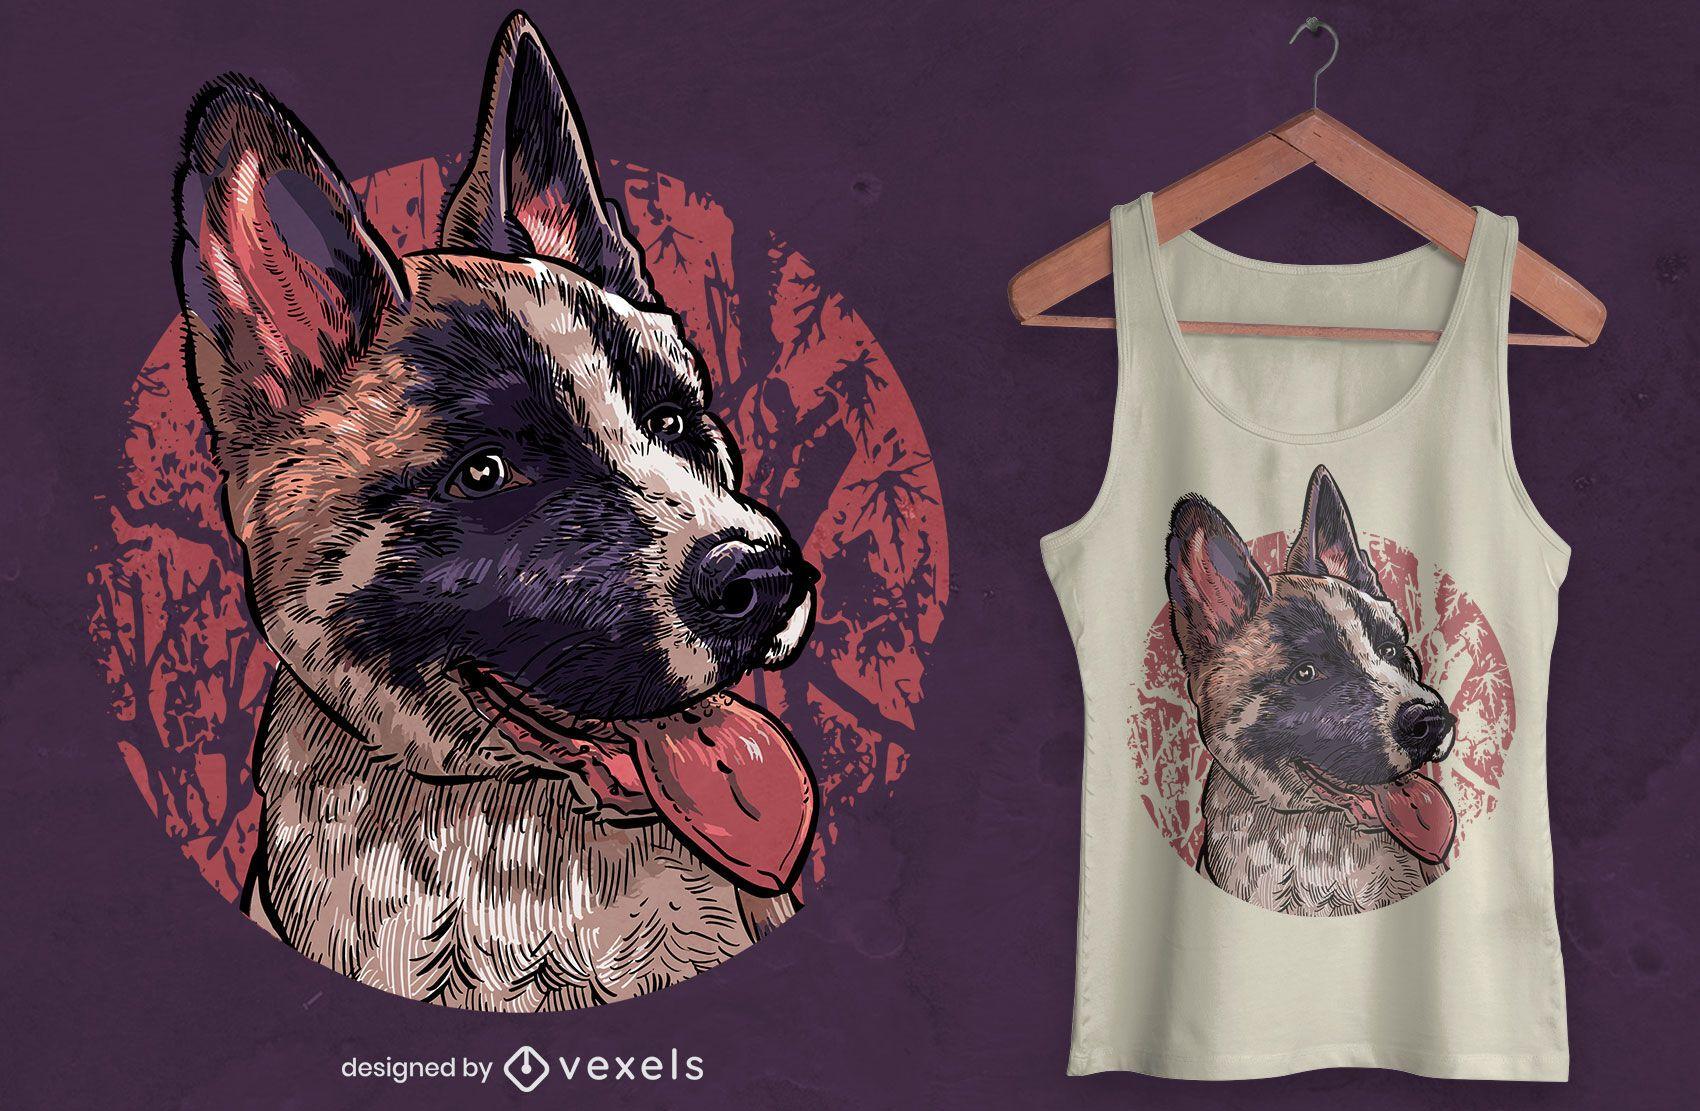 Puppy dog illustration t-shirt design